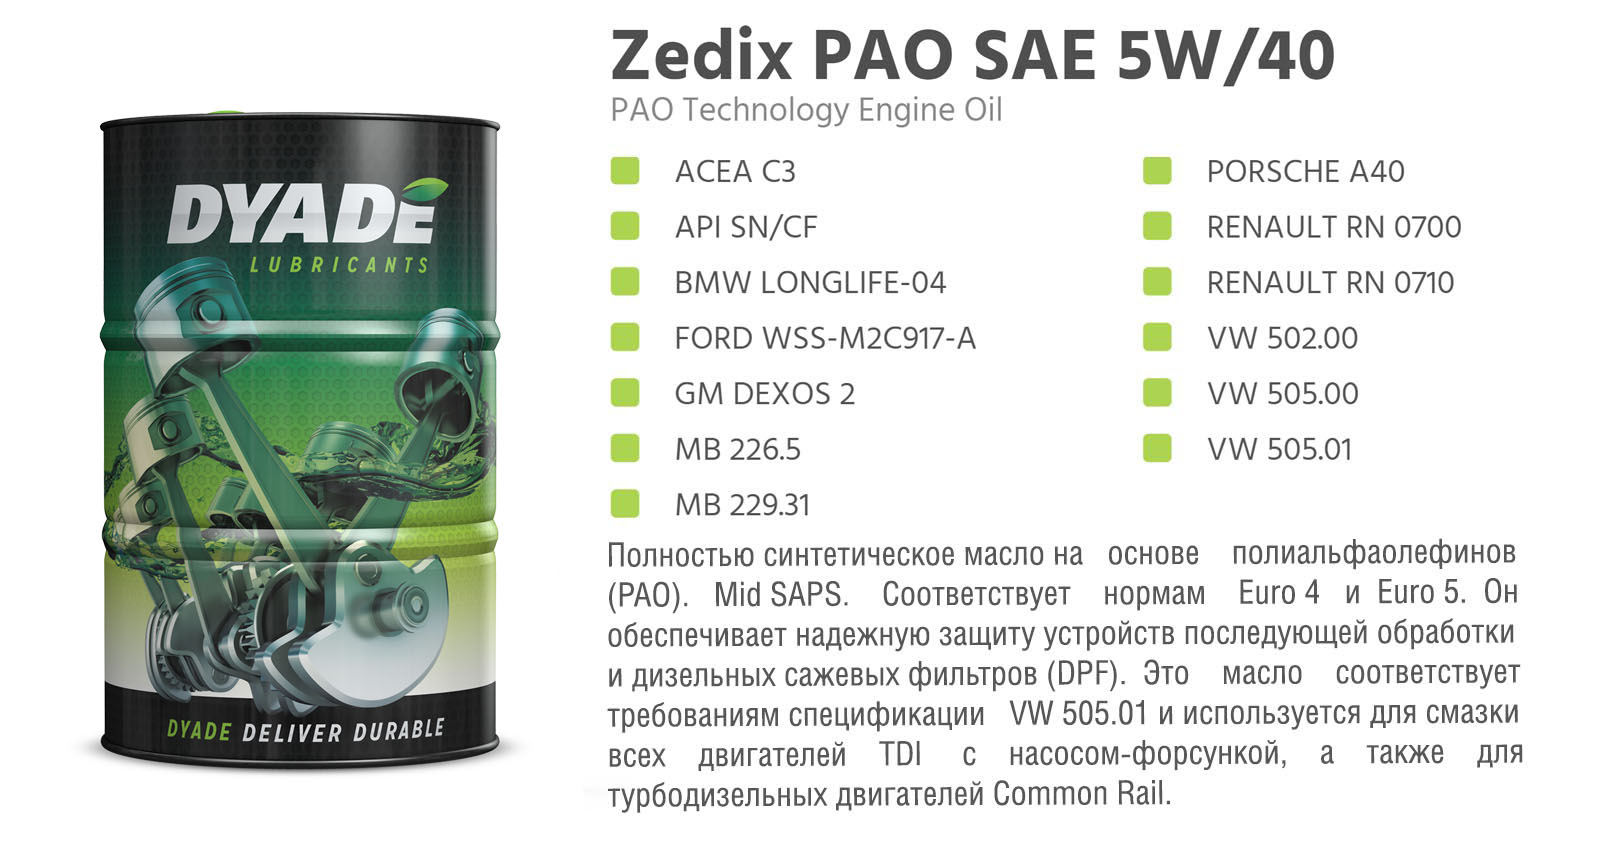 Масло моторное Zedix PAO SAE 5W40 (205L) 575645 dyadelubricants